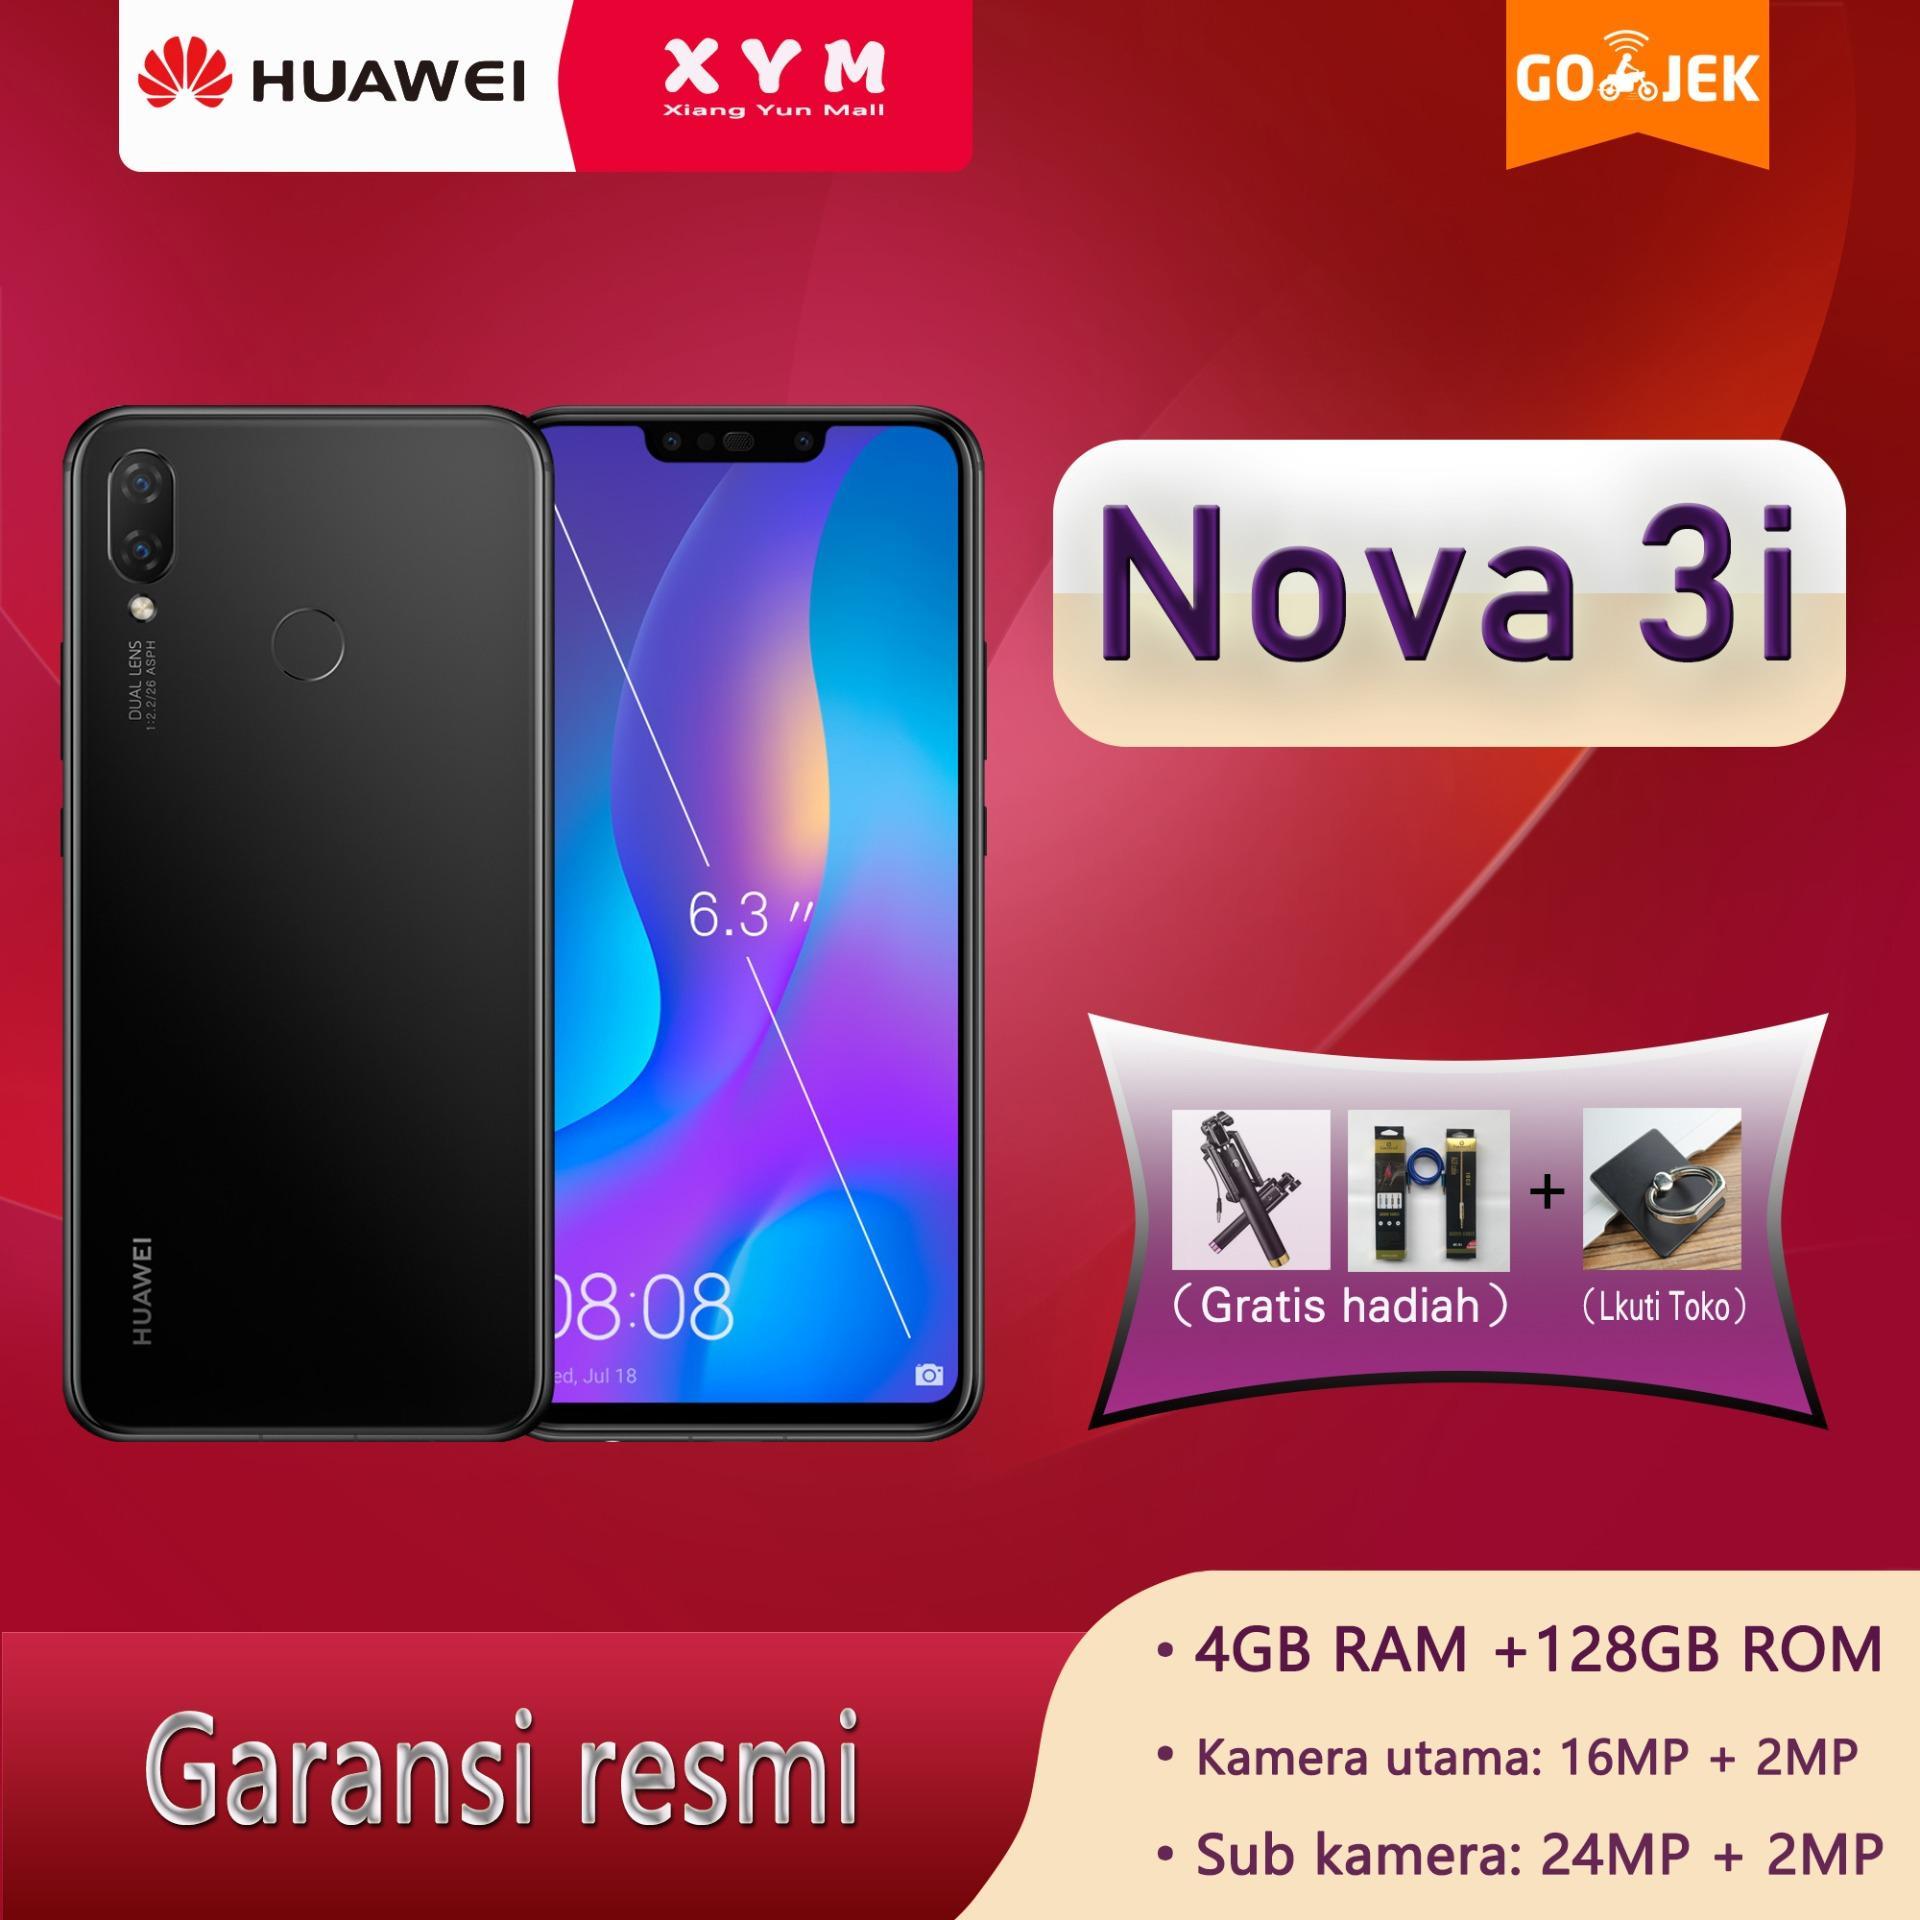 Handphone Huawei Lengkap P10 Plus Ram 6gb Memori 128gb Garansi 1 Tahun Nova 3i 4g 128g 63 Inch Layar 4 X Kamera Komunikasi Ai